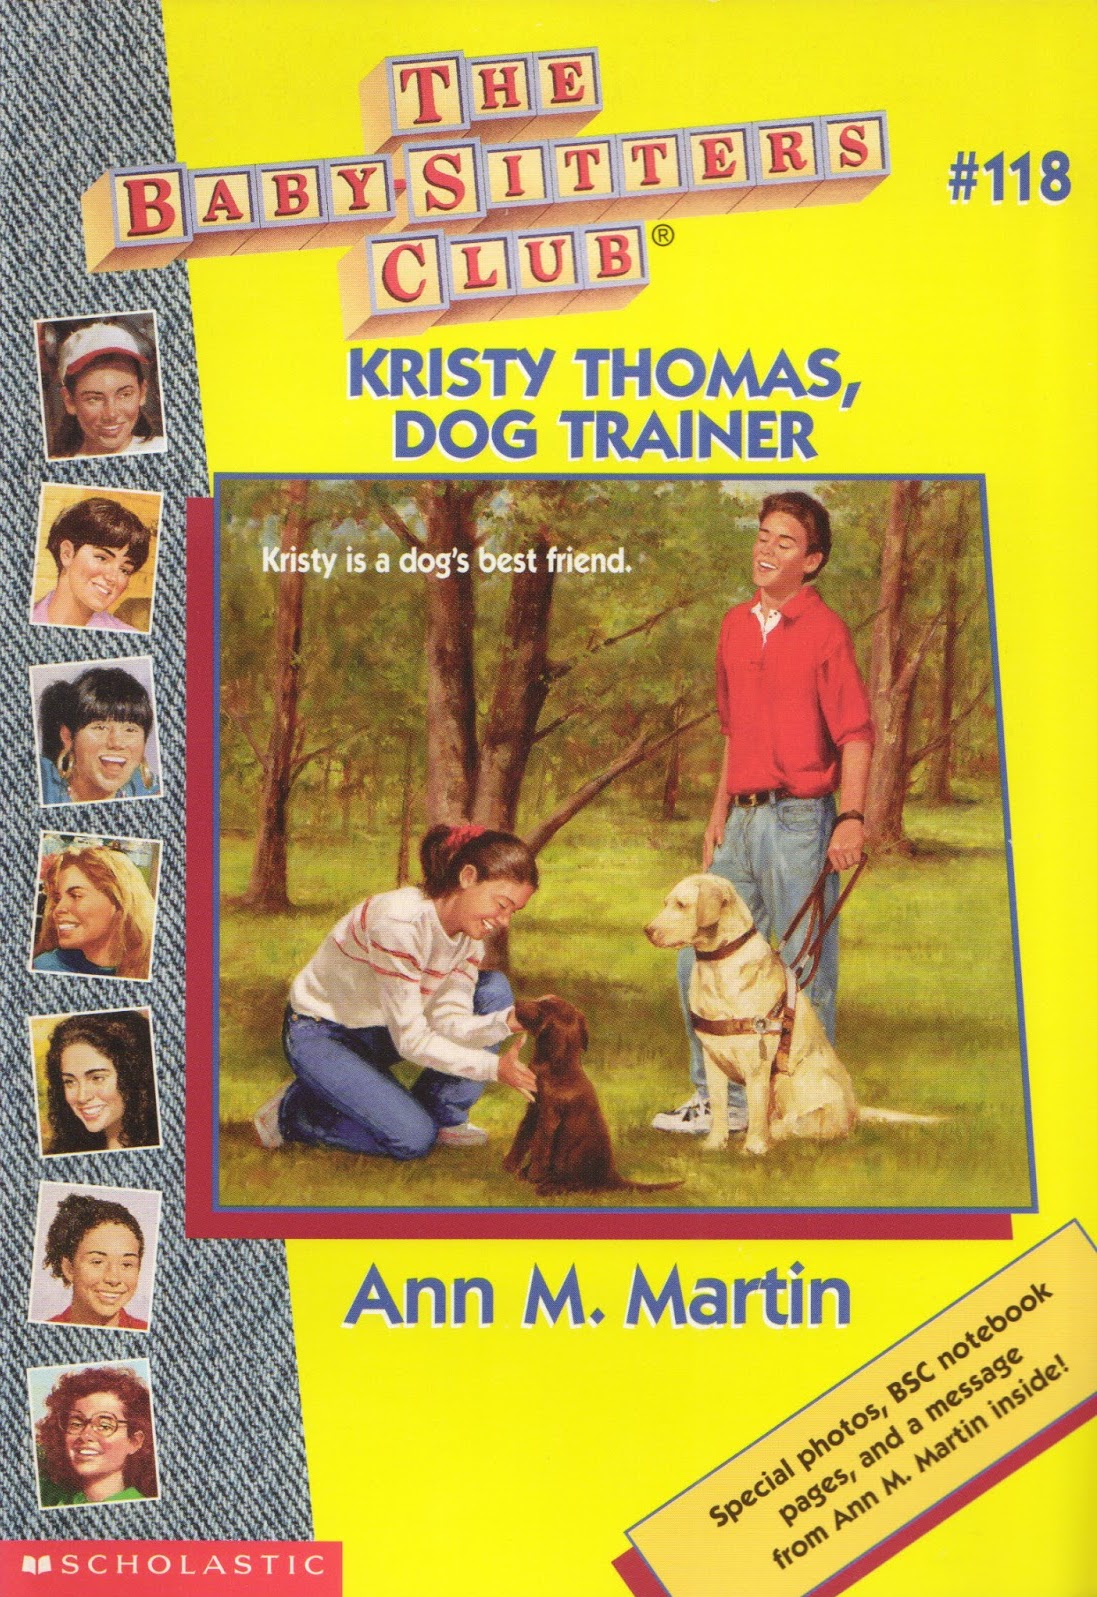 kristy thomas dog trainer the baby sitters club wiki fandom